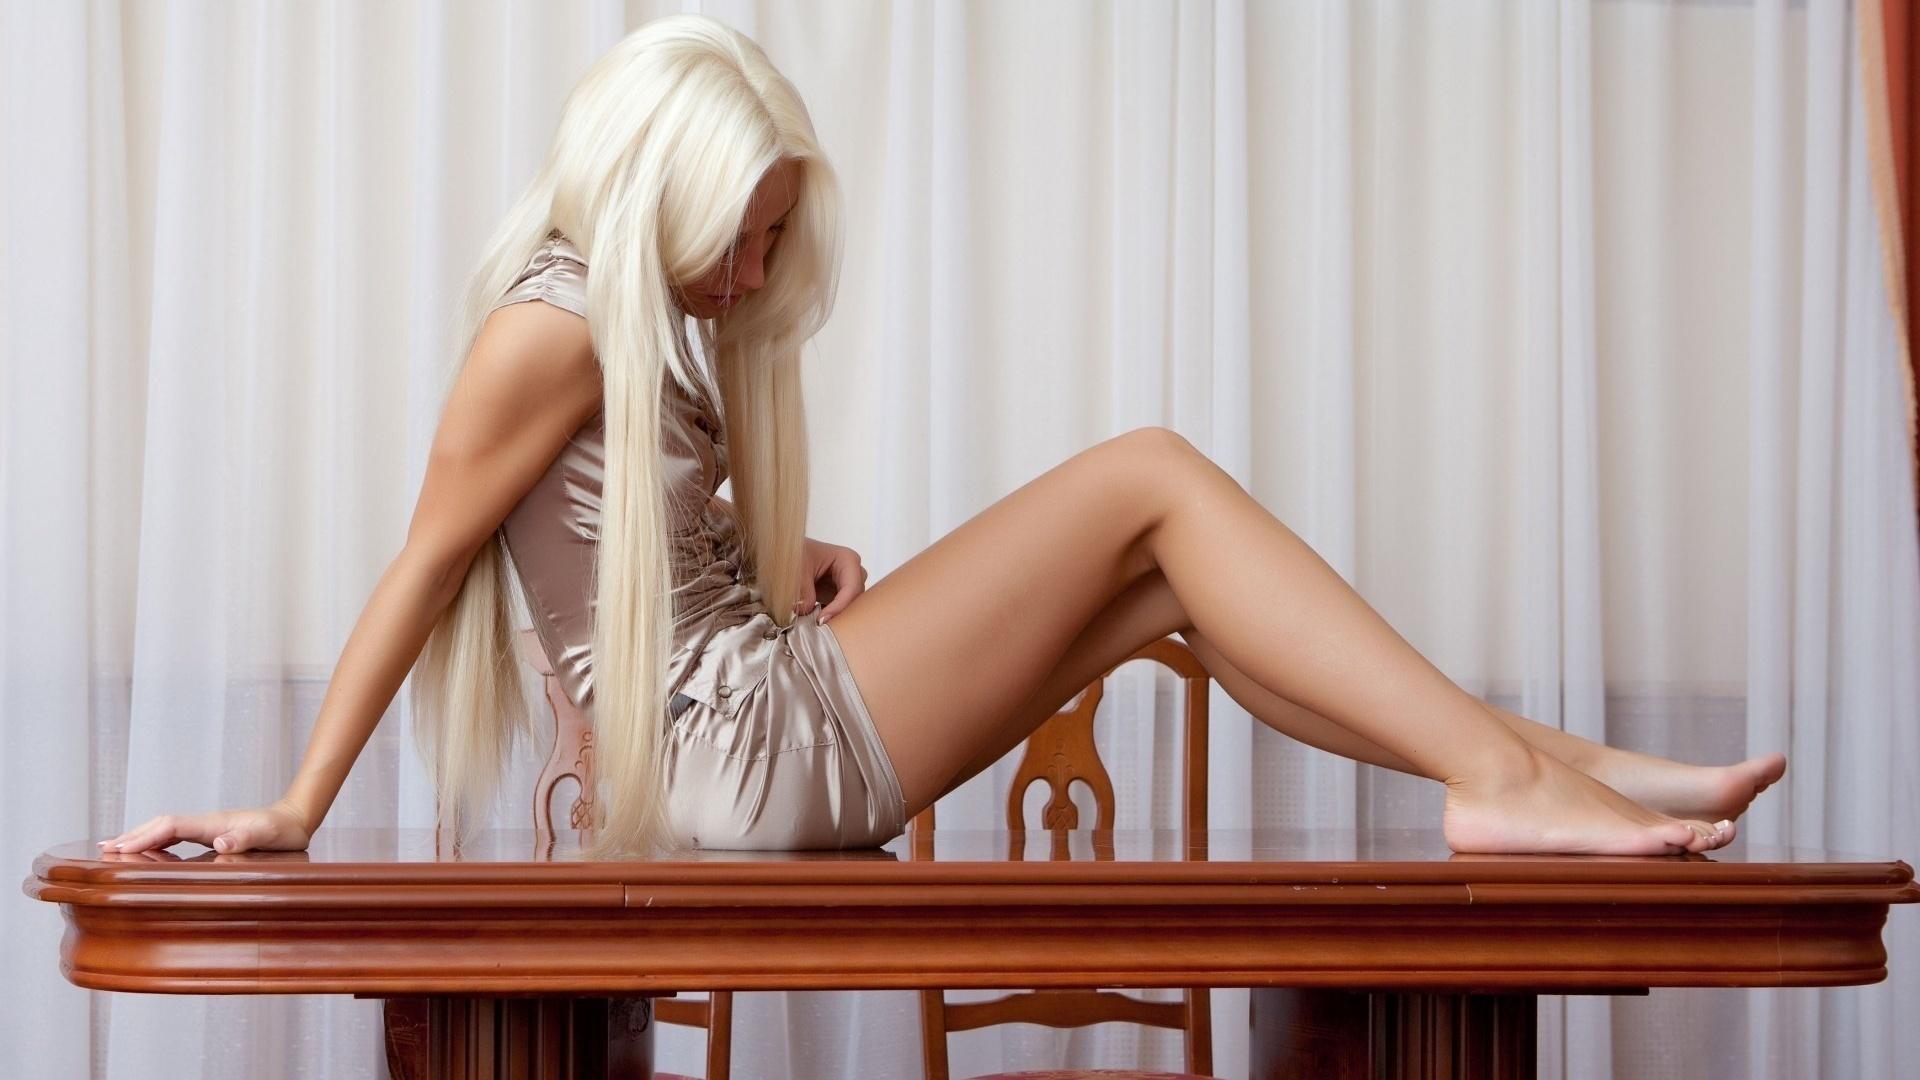 Раздвинула ноги девушки, Девушки с раздвинутыми ногами (45 фото) 19 фотография